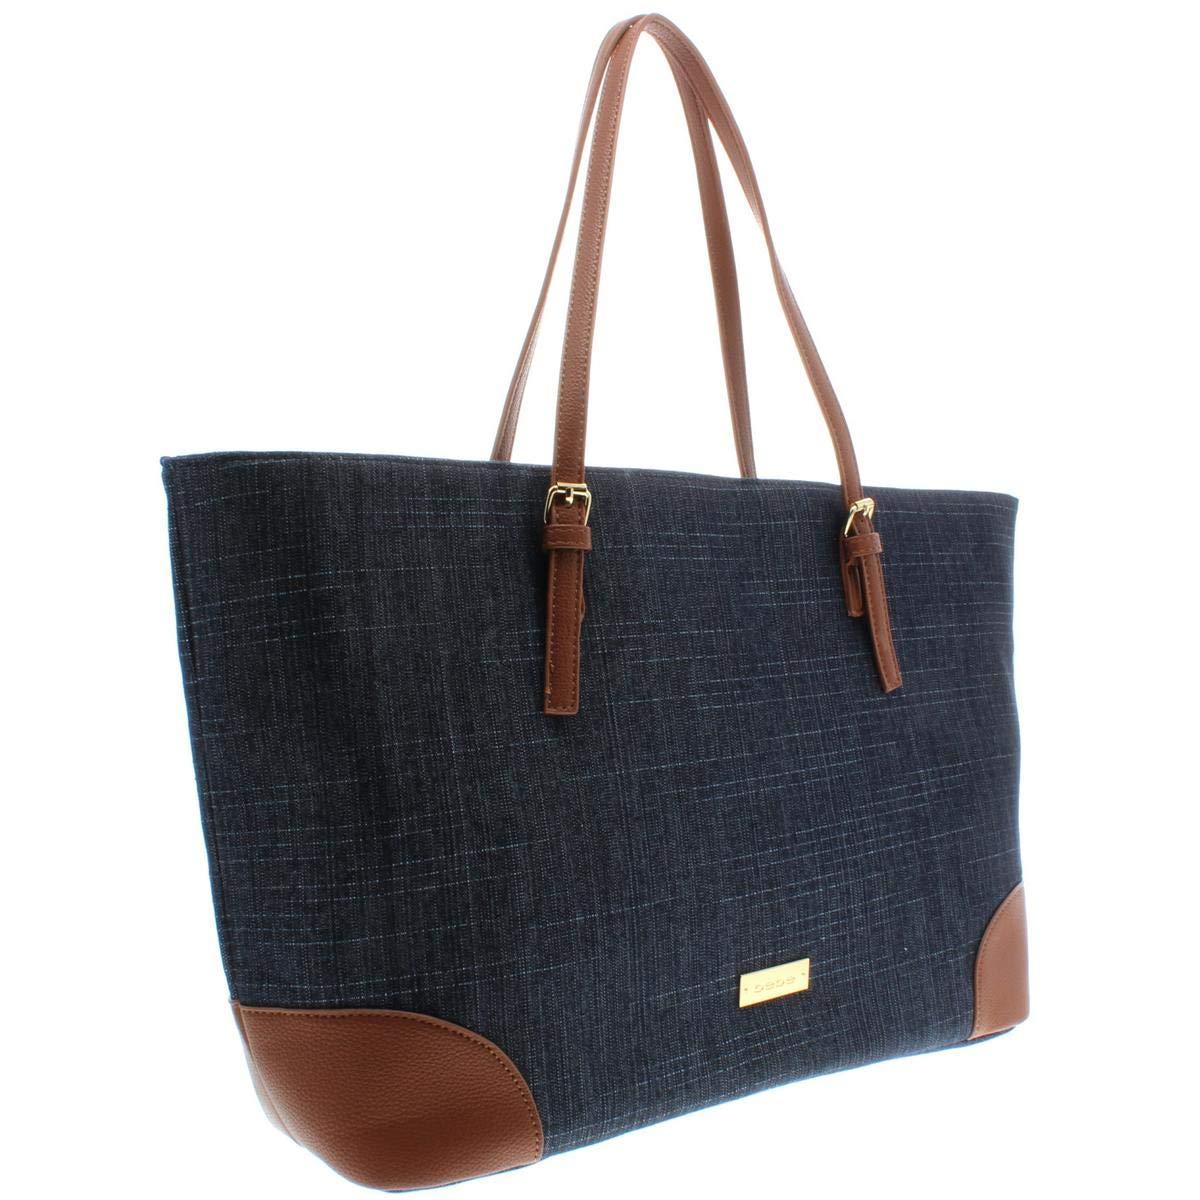 e95b86eca3bc Bebe Womens Debbie Faux Leather Trim Shopper Tote Handbag Denim Large